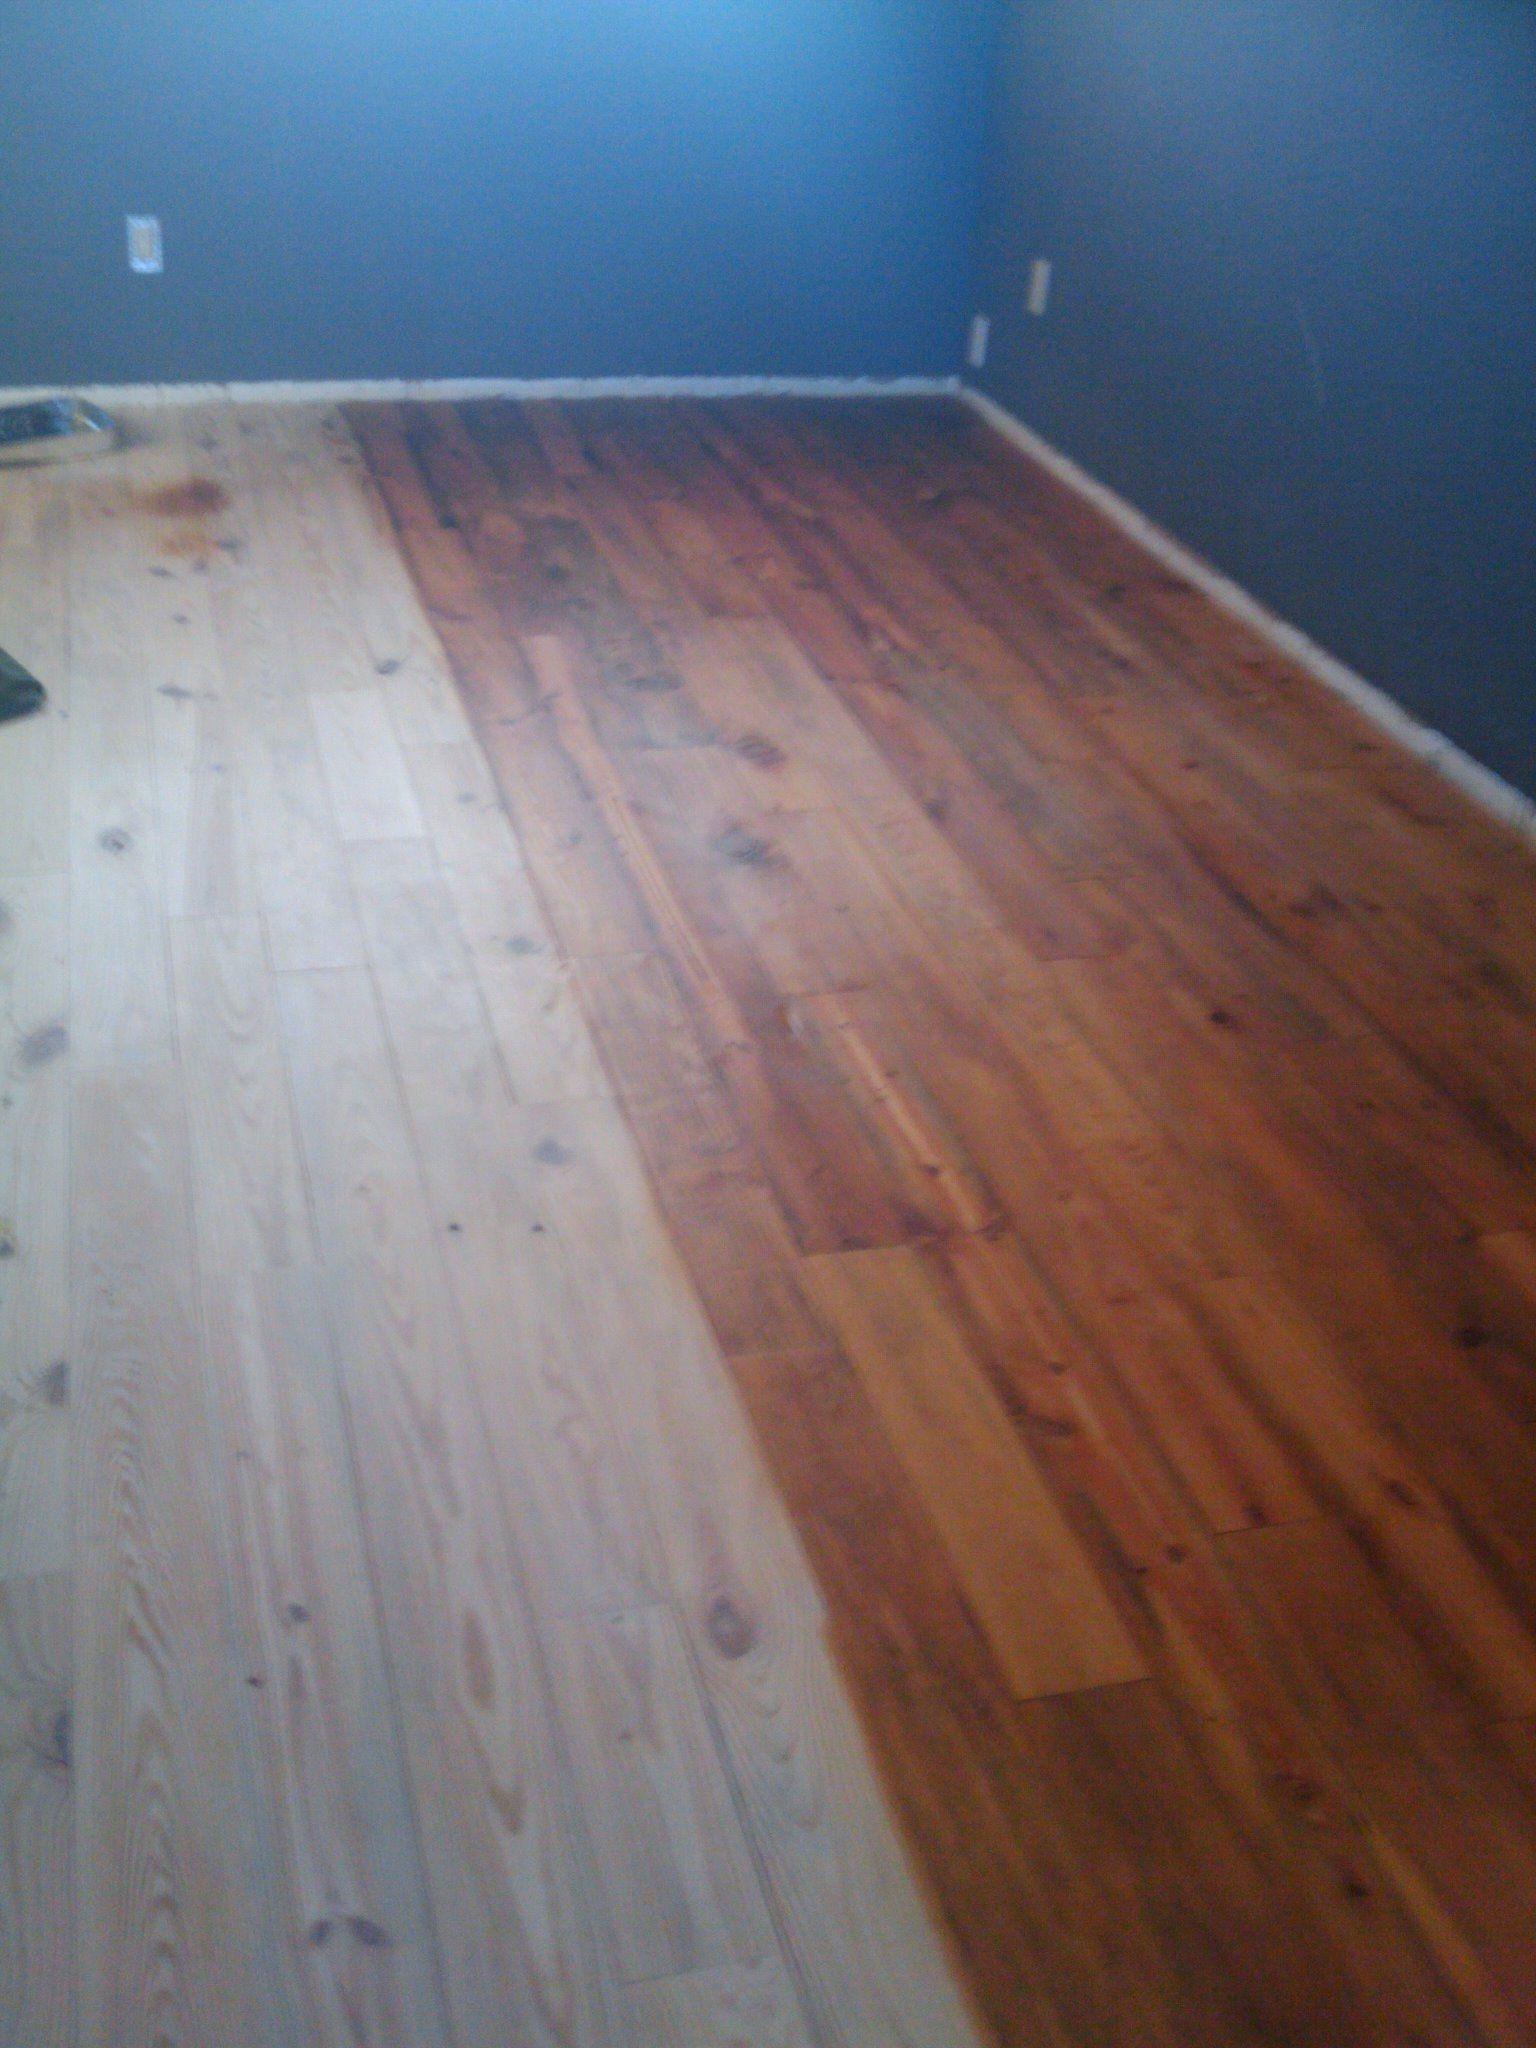 Red Oak Stain On Reclaimed Heart Pine